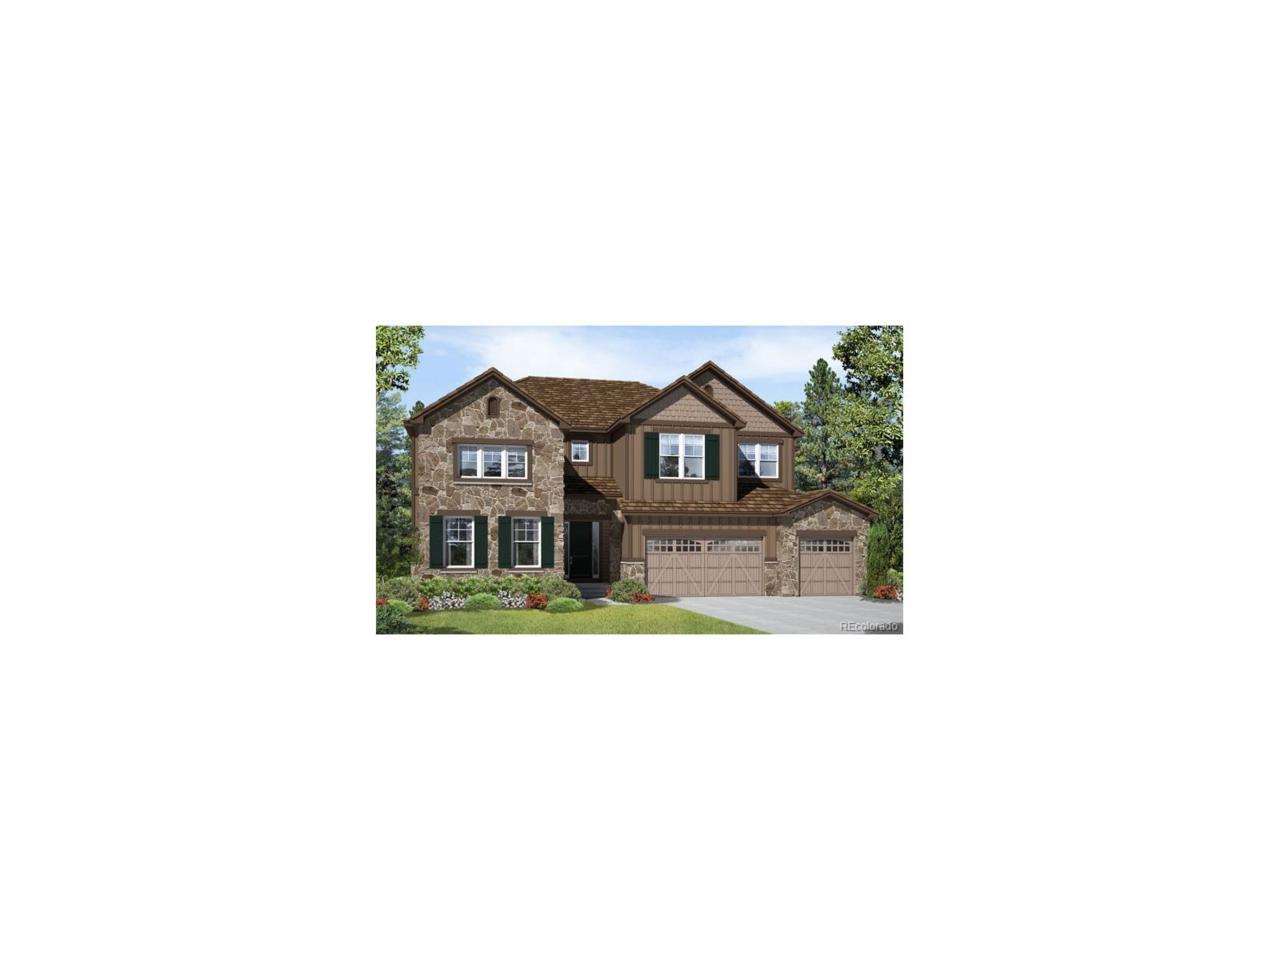 27728 E Kettle Place, Aurora, CO 80016 (MLS #6305191) :: 8z Real Estate